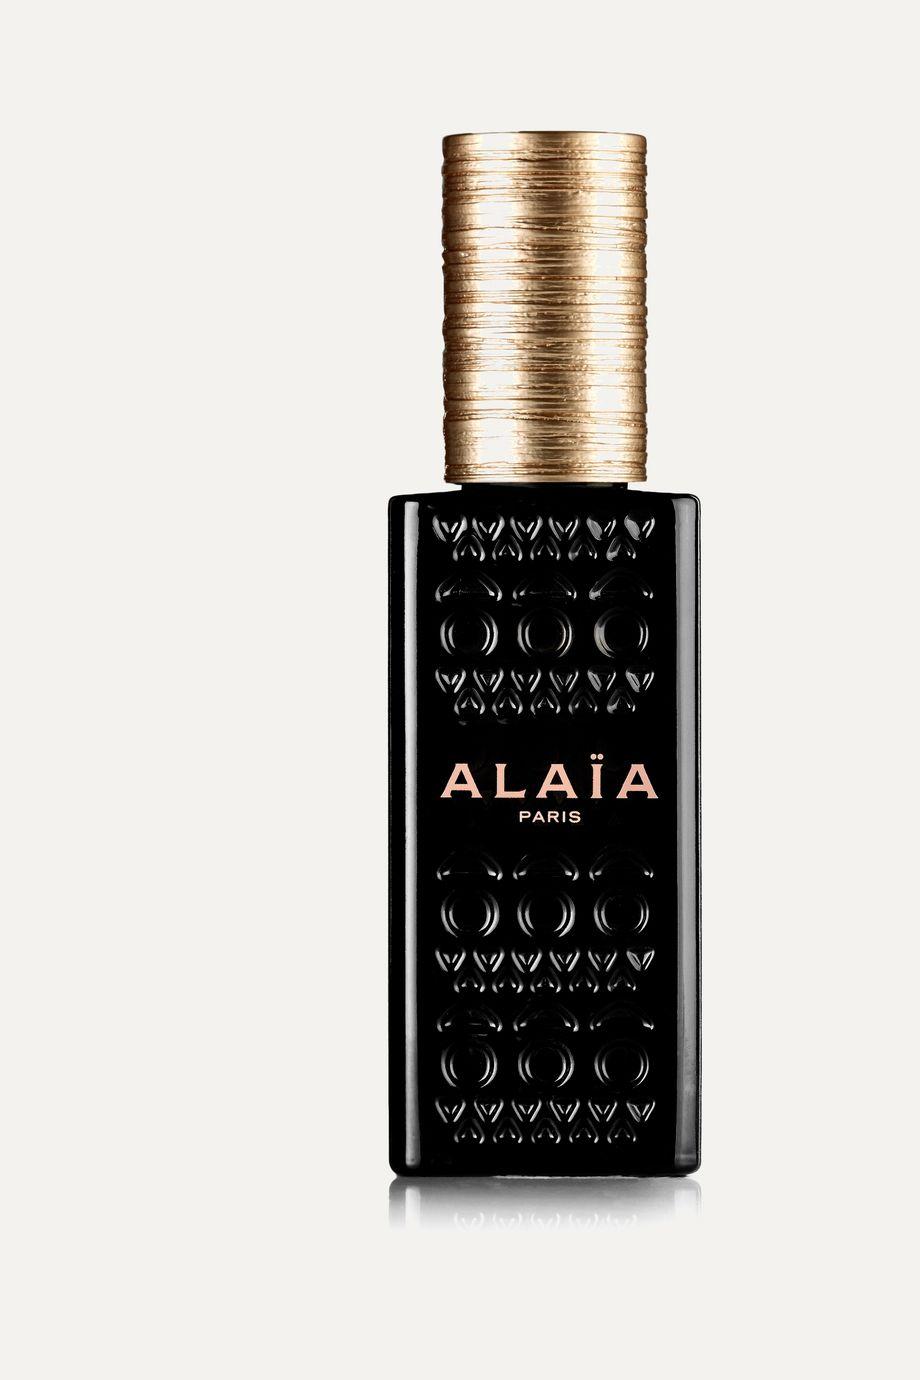 Alaïa Beauty ALAÏA PARIS, 30 ml – Eau de Parfum